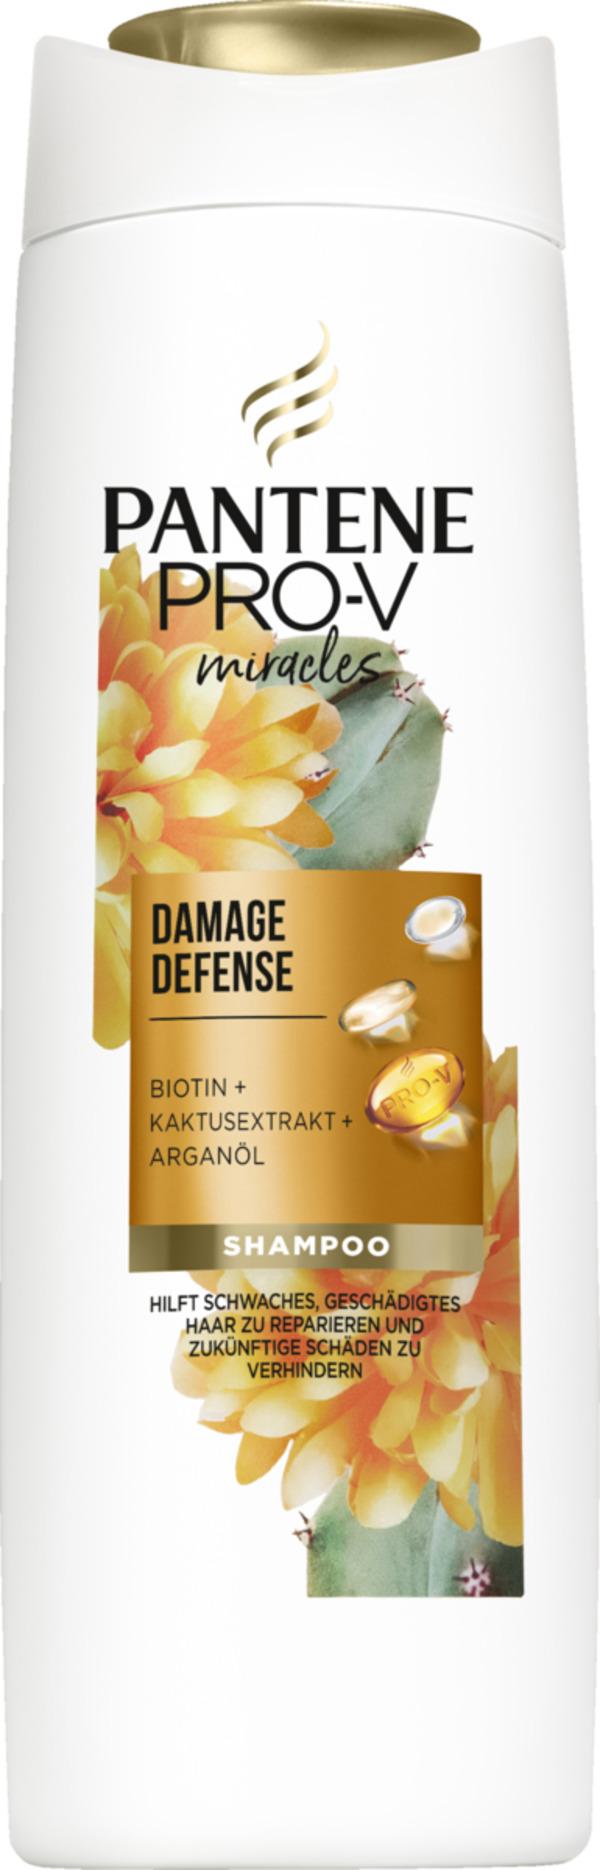 Pantene Pro-V miracles Damage Defense Shampoo